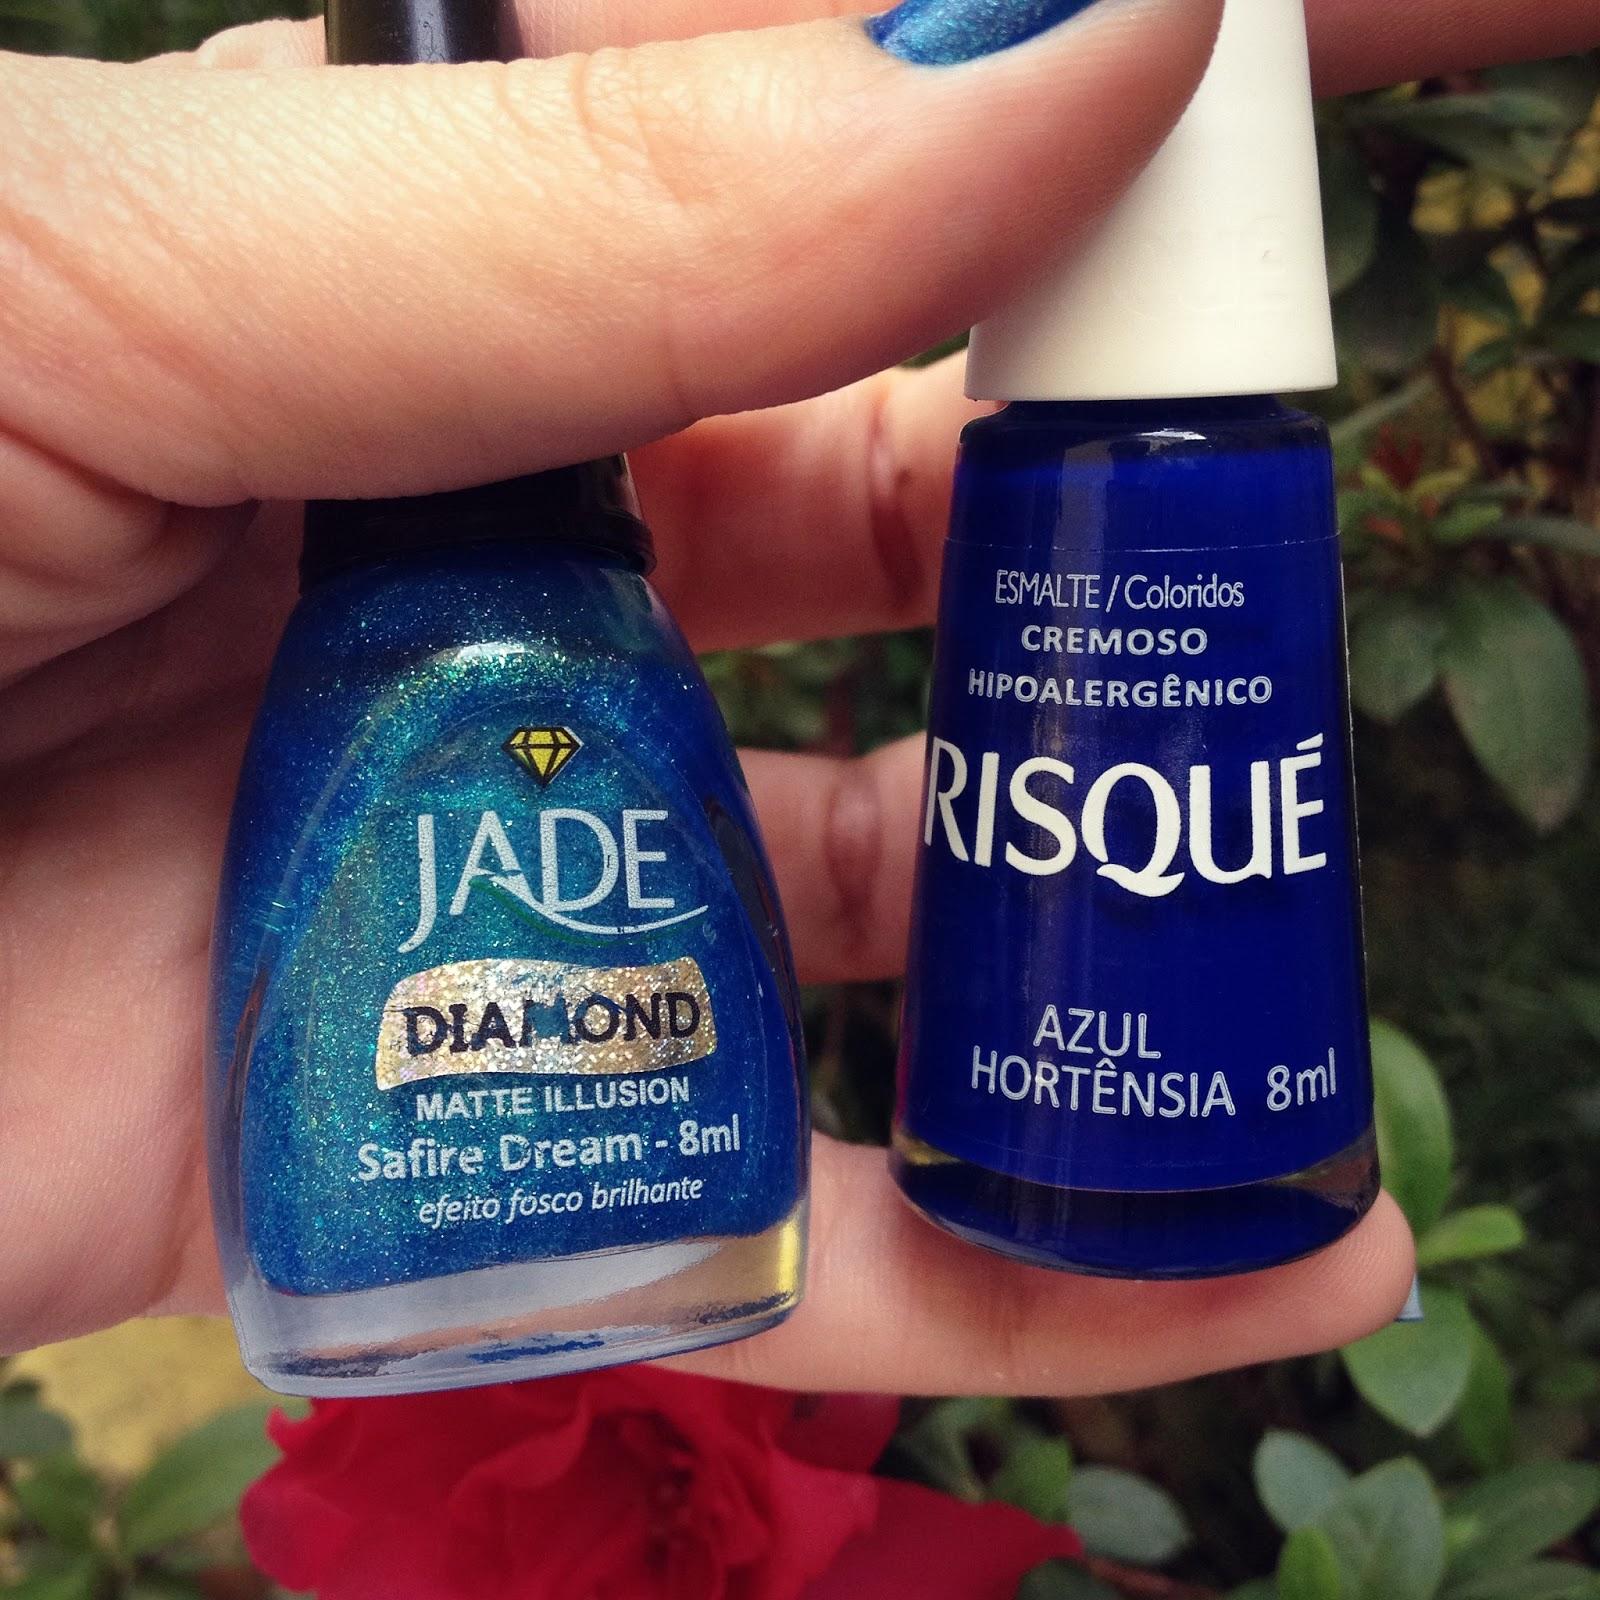 esmalte azul hortênsia da Risqué